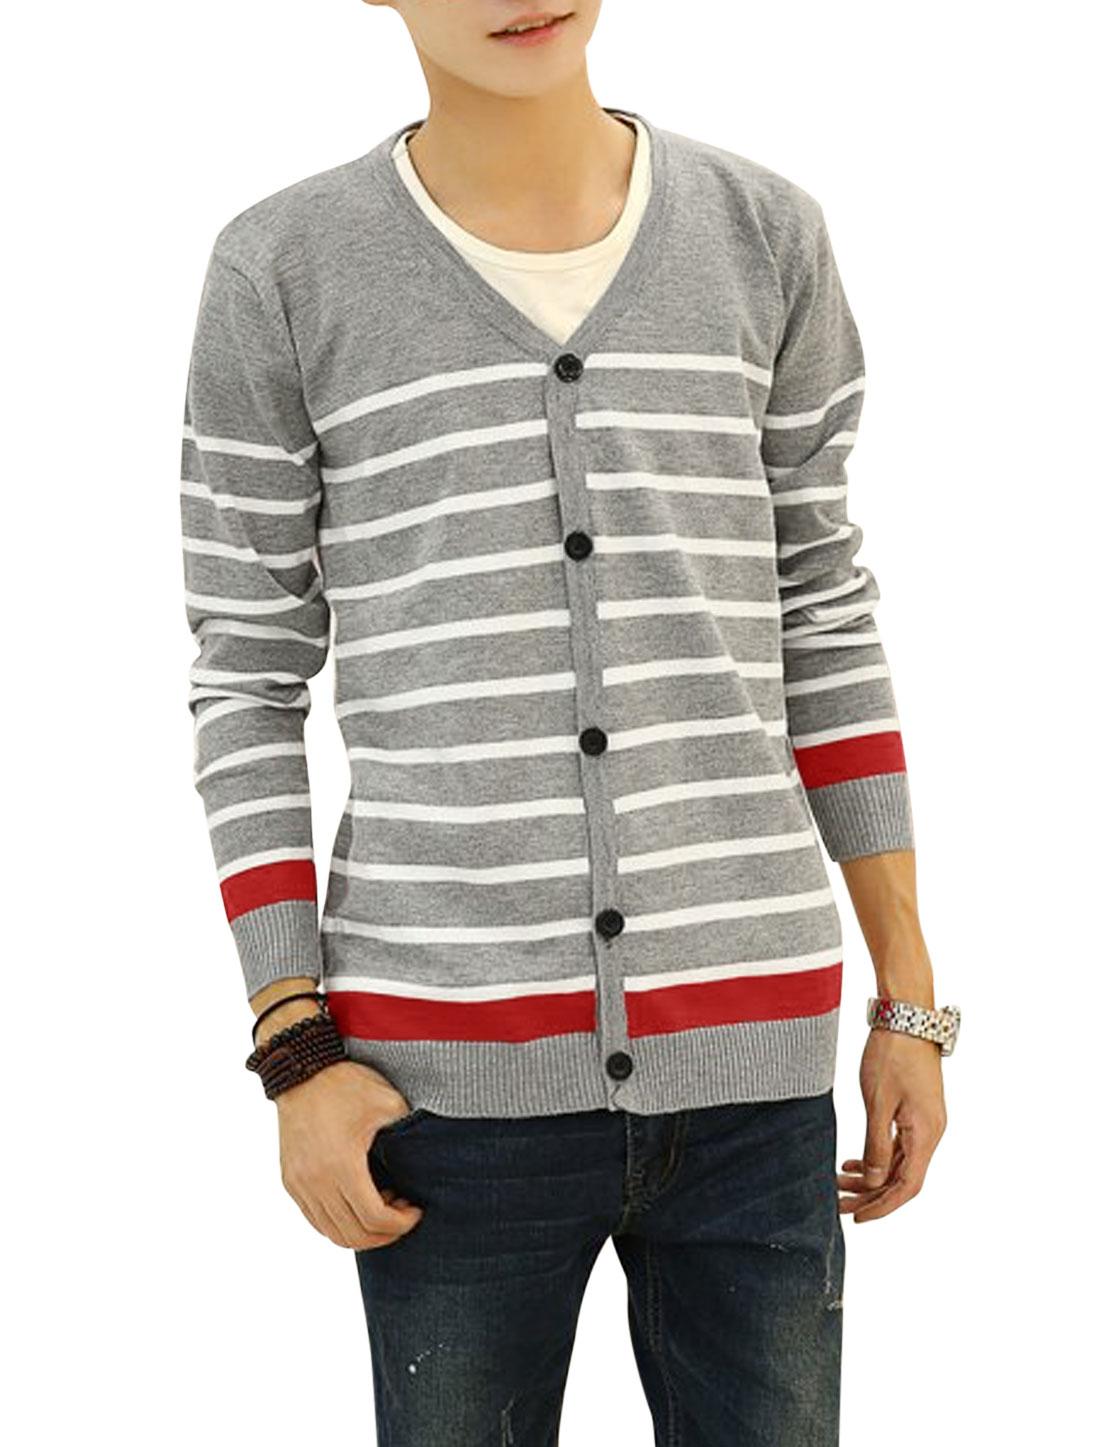 V Neck Horizontal Stripes Casual Knit Cardigan for Men Light Gray S